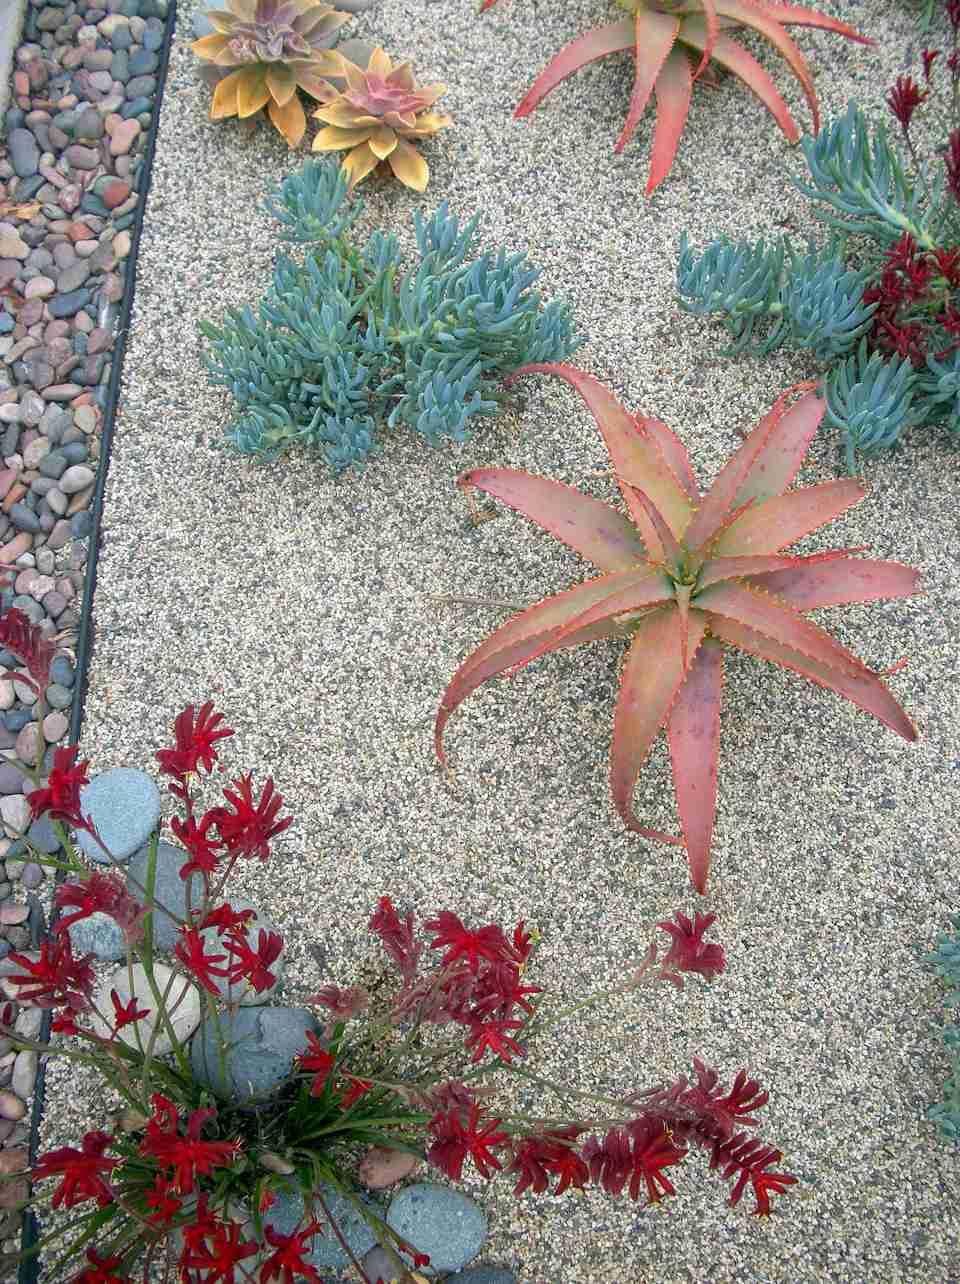 dry garden succulents wordless wednesday venice beach